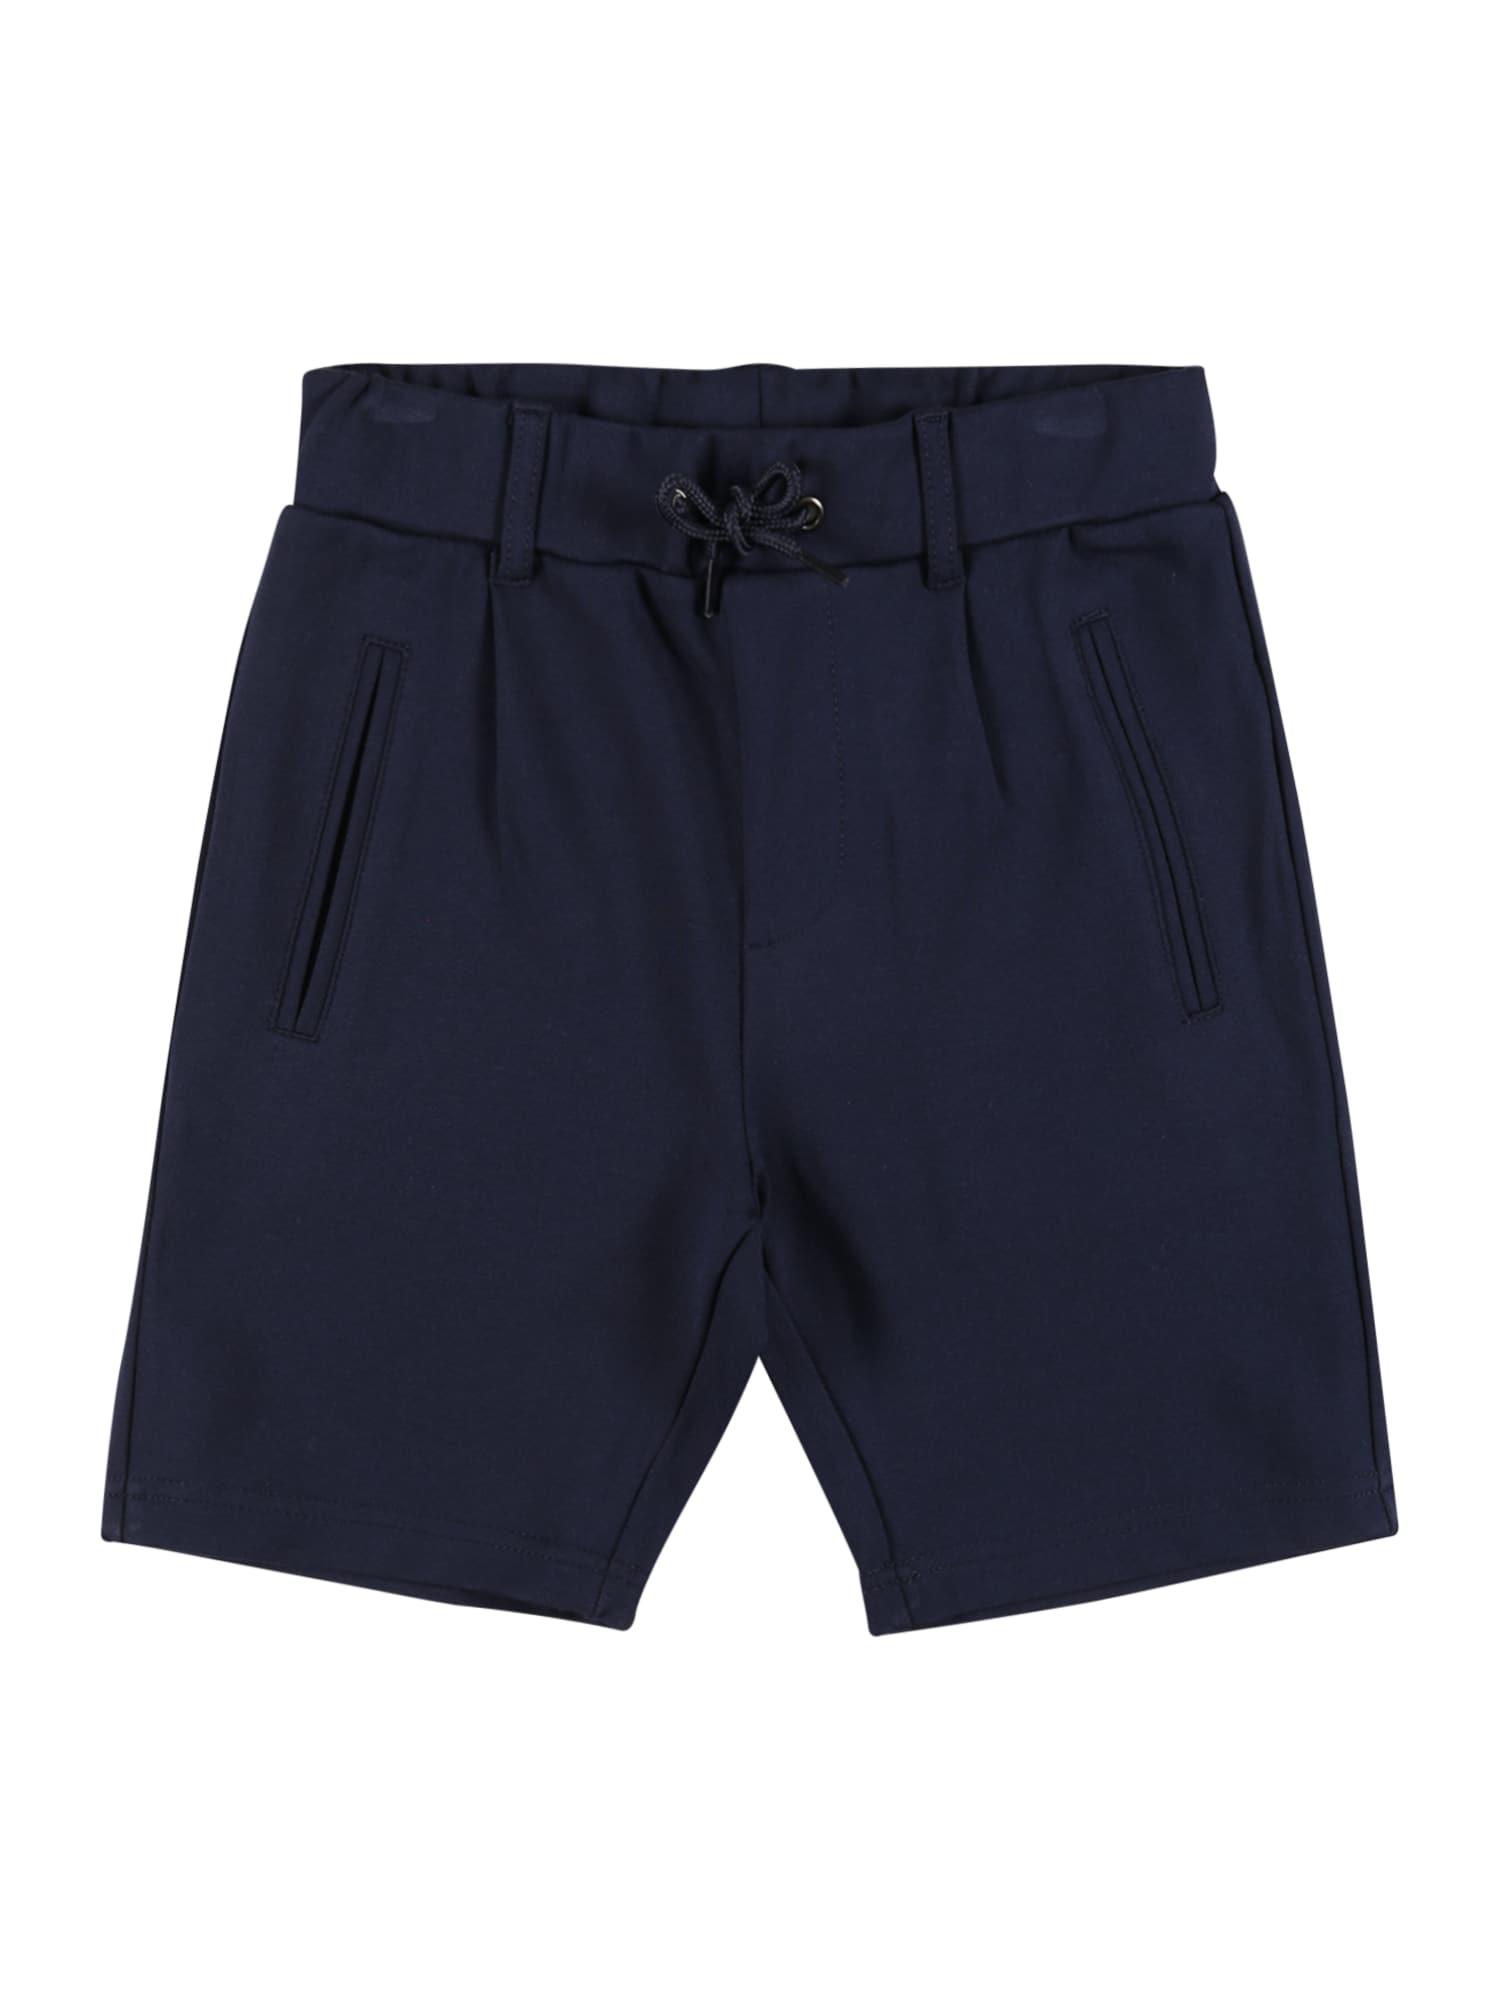 The New Kelnės